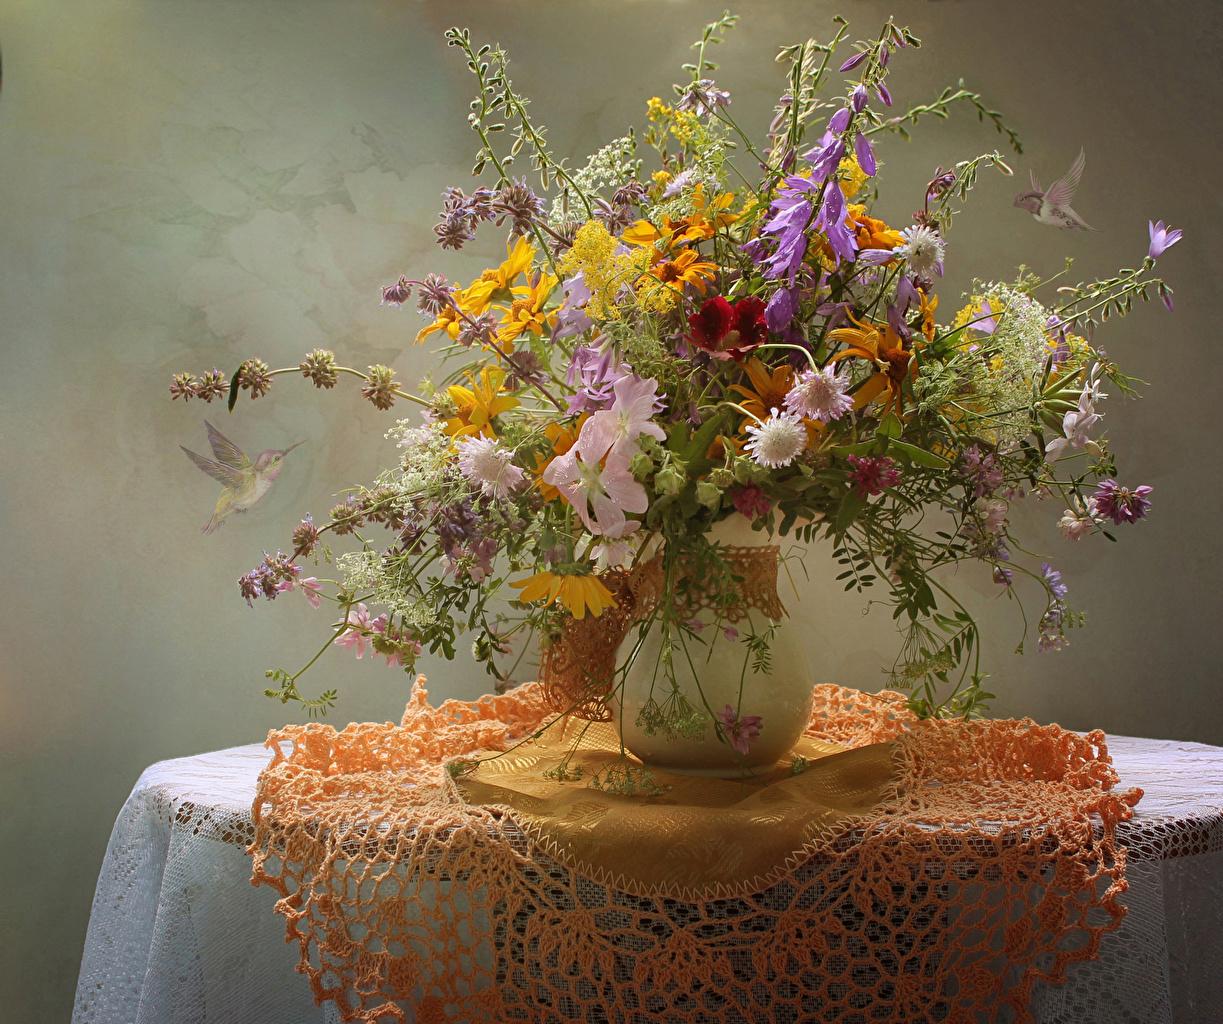 Image Tablecloth Bouquets Flowers Gazania Vase Bells Table Centaurea bouquet flower Handbell Cornflowers